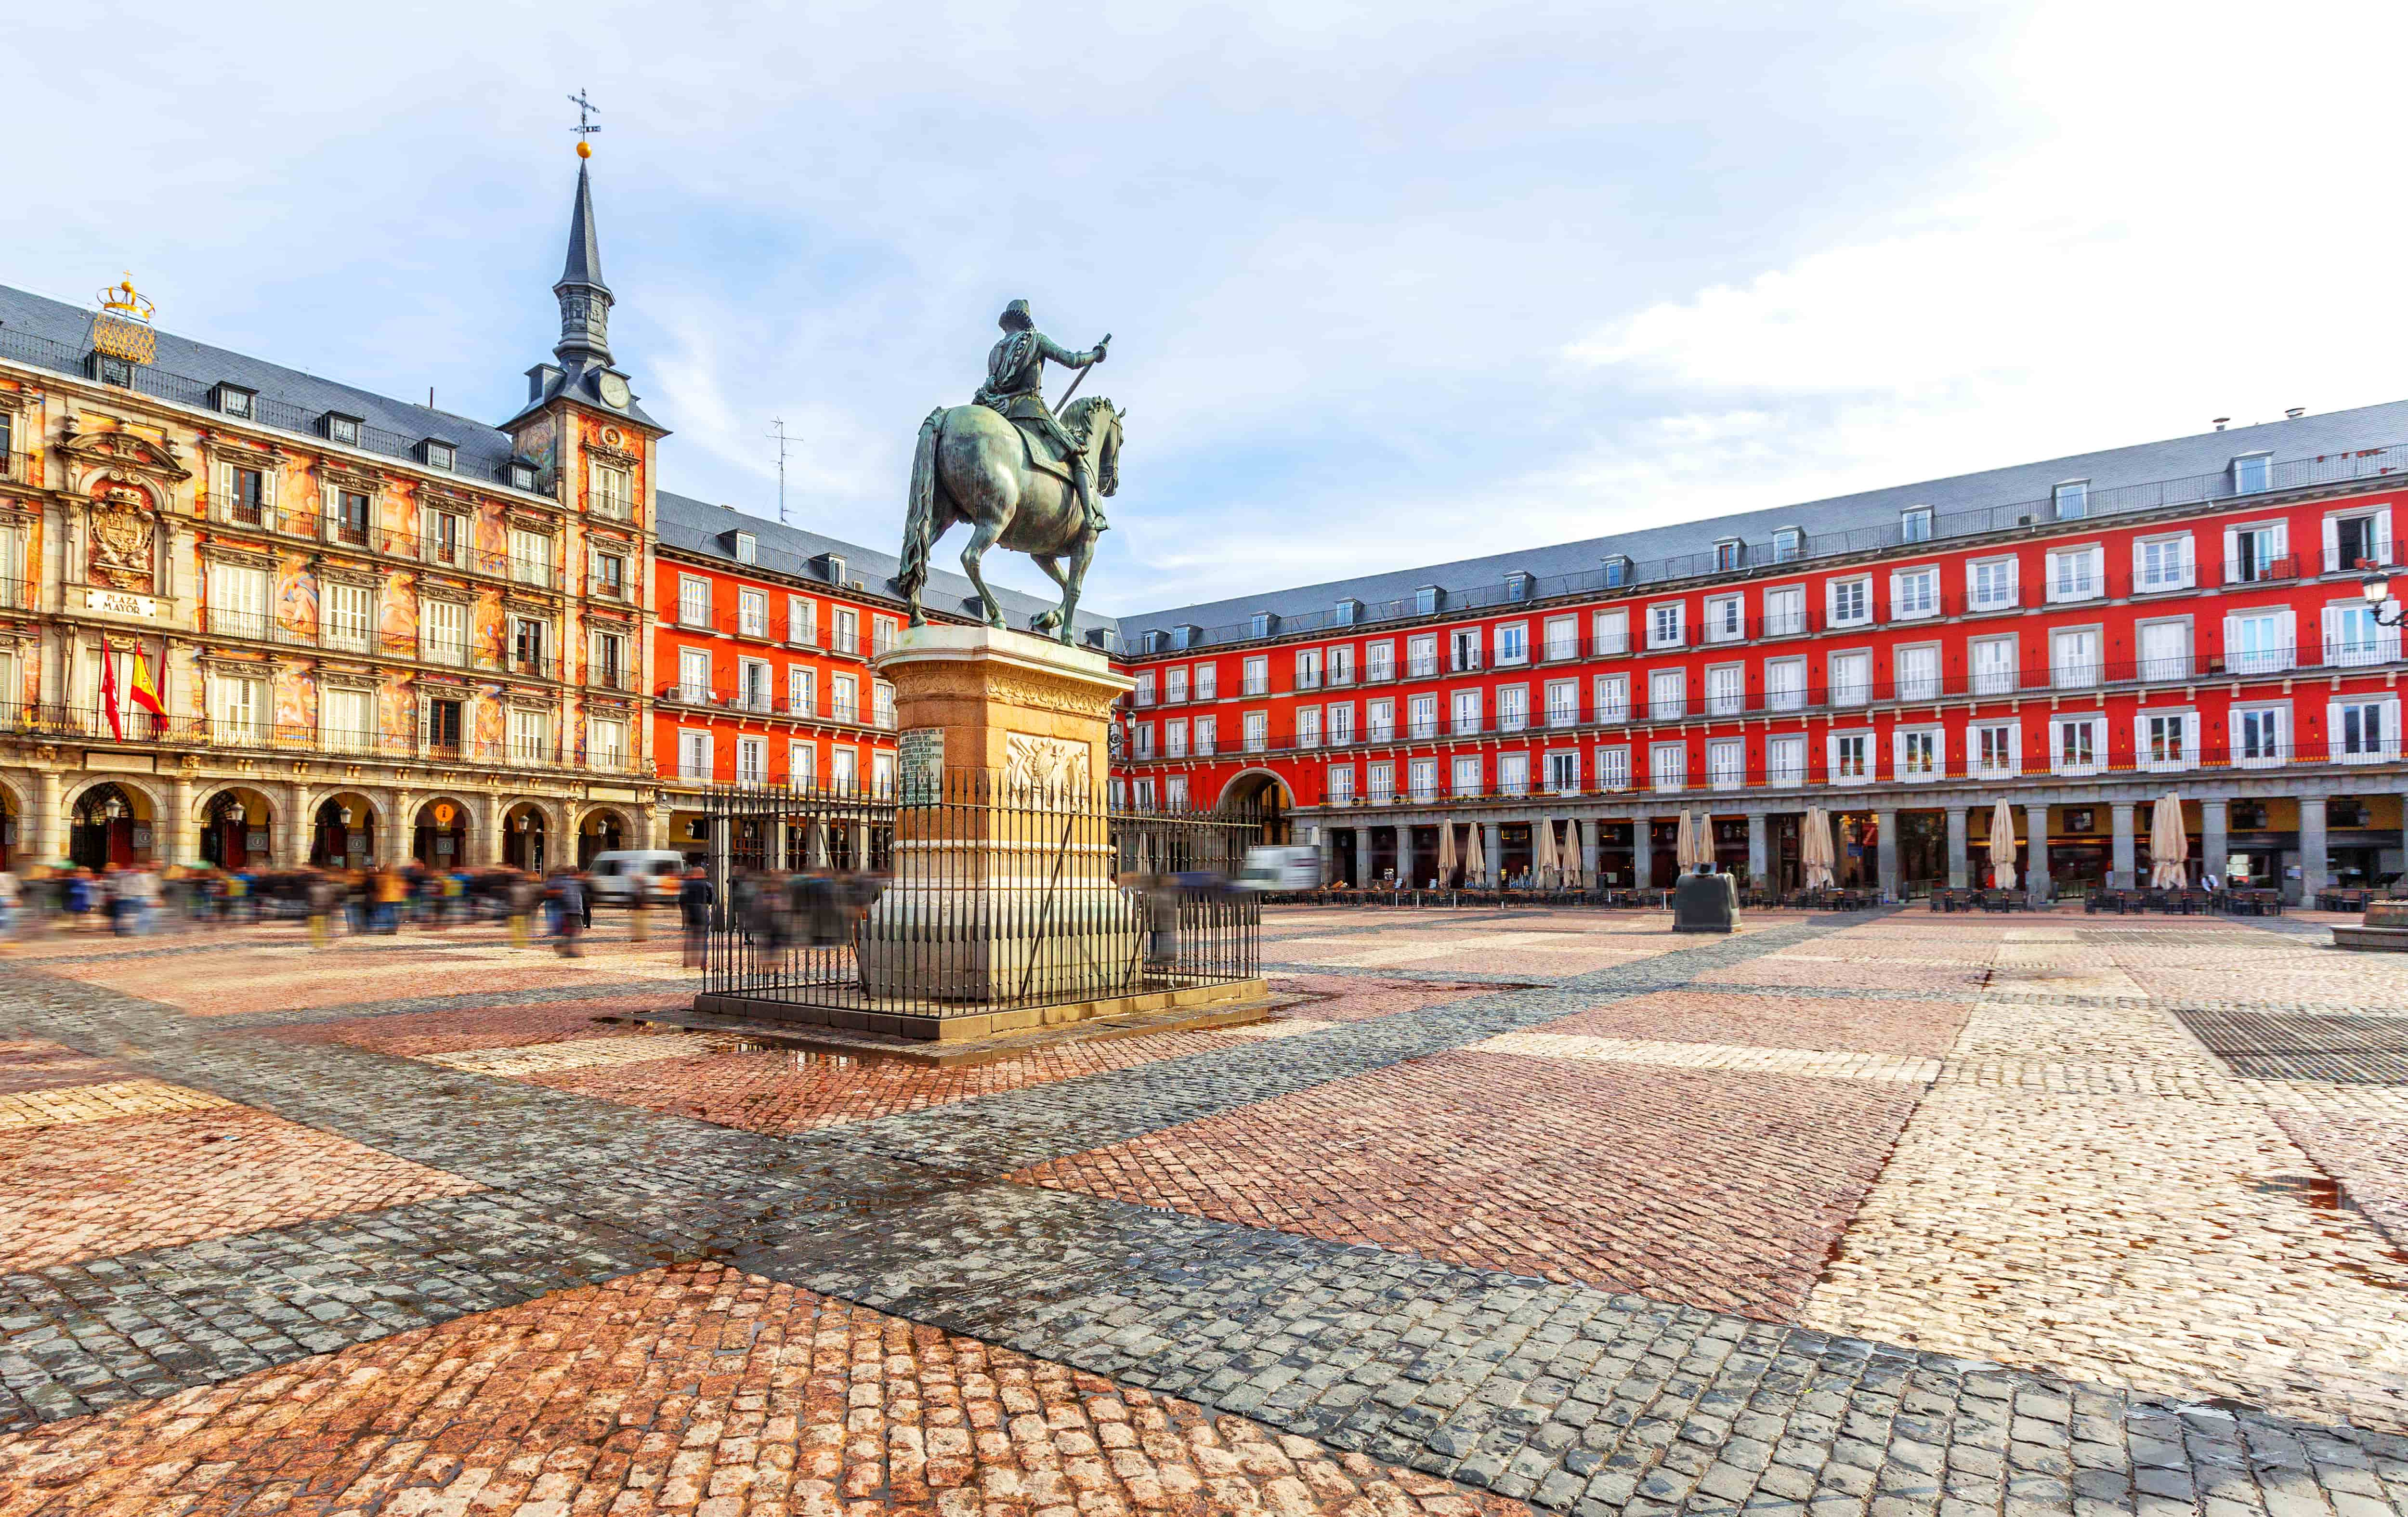 Madrid_Espagne_Plaza Mayor with statue of King Philips III in Madrid, Spain_110515761-min